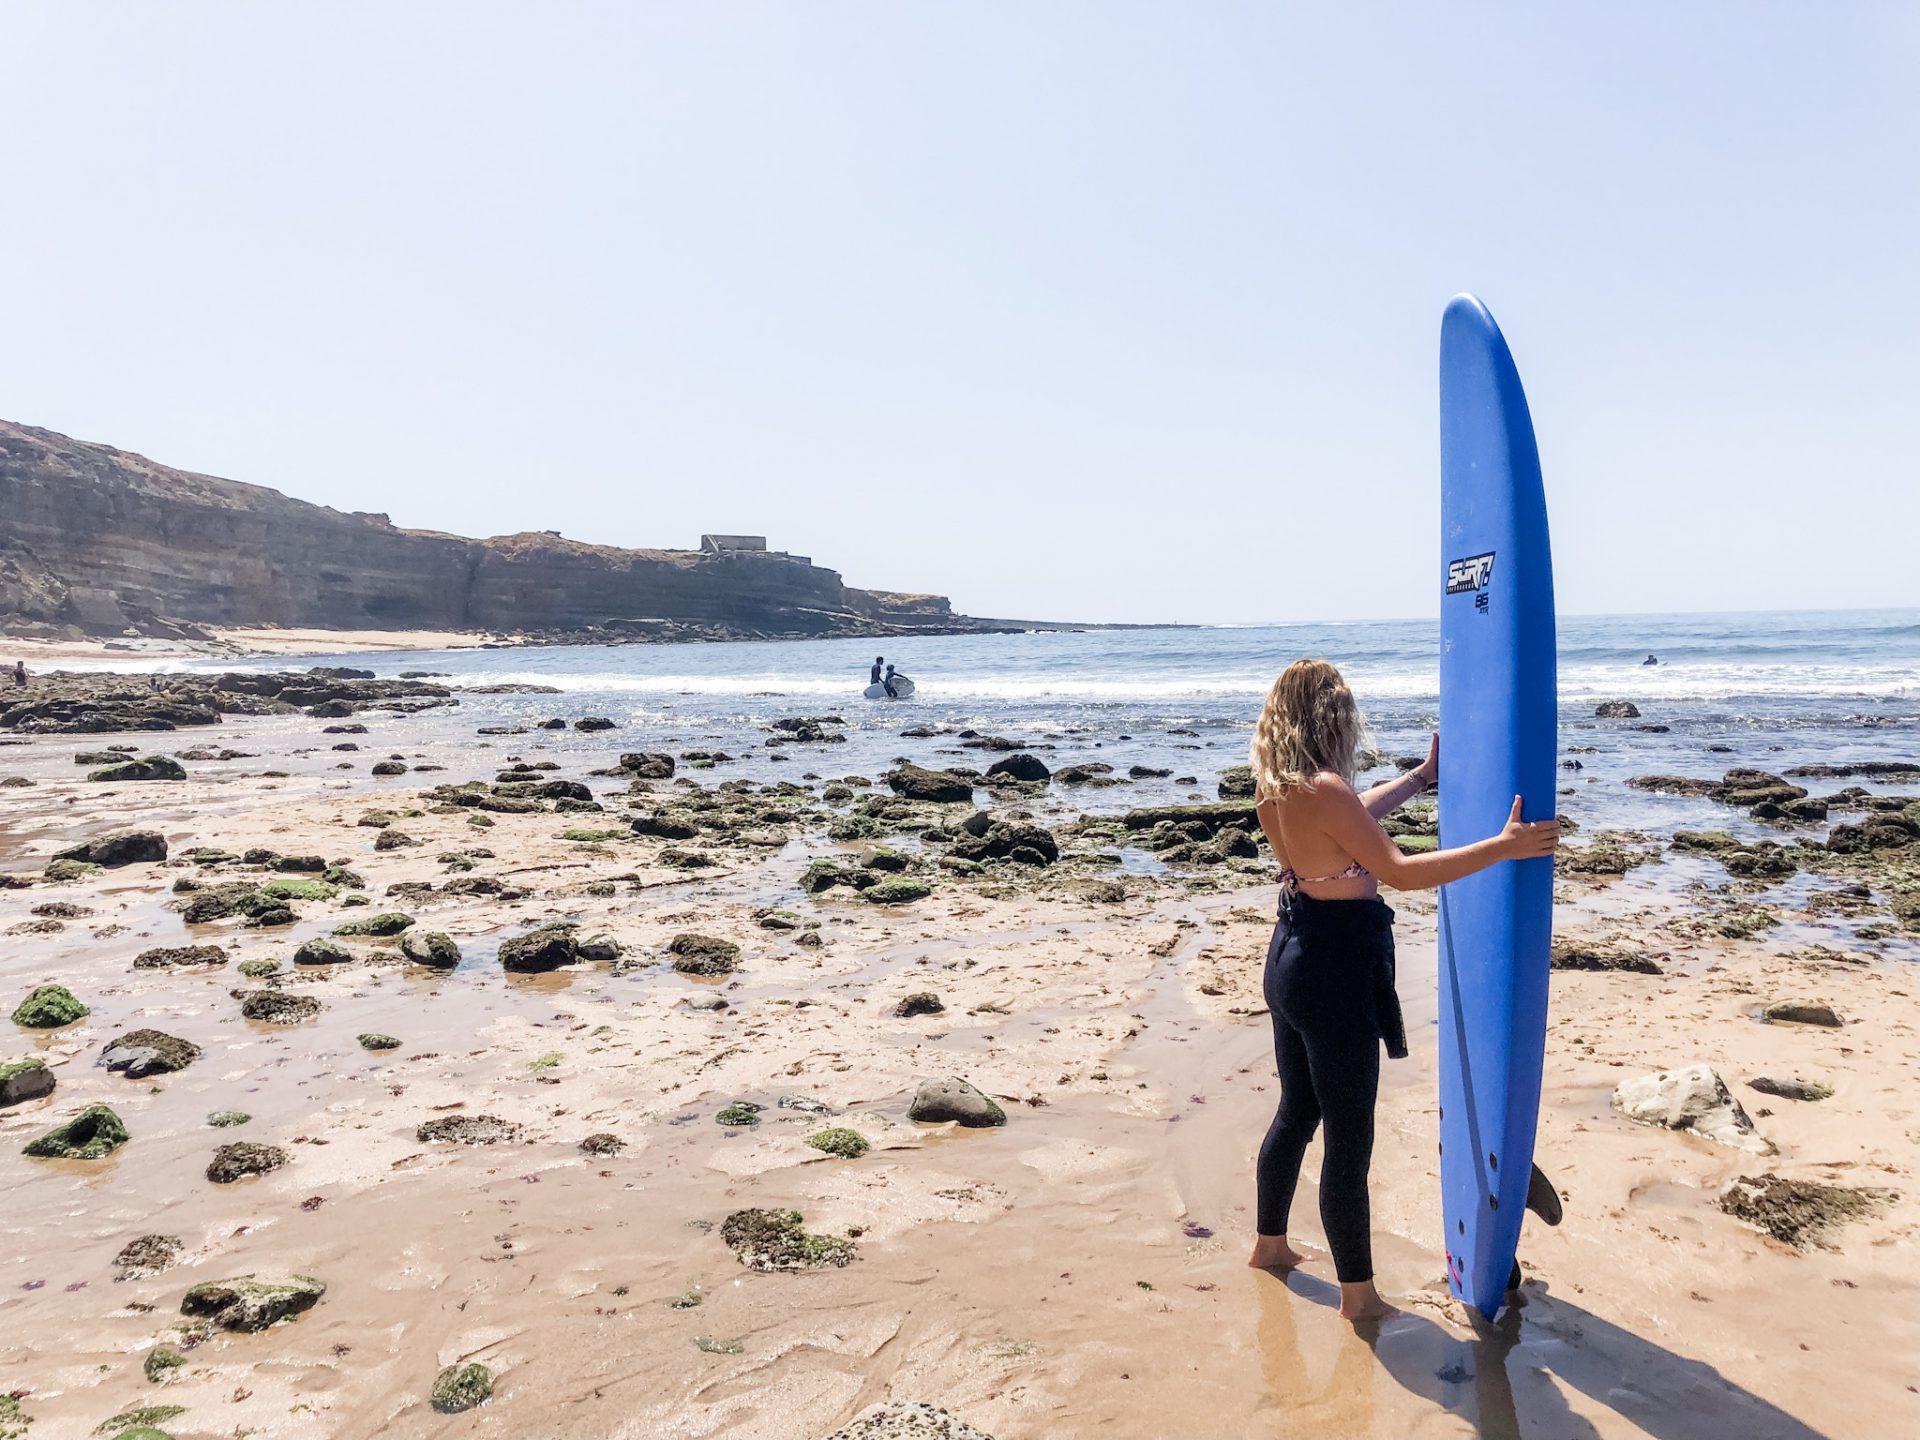 Surfen in Portugal: Surf & Yoga Camp im Surfmekka Ericeira! - LIEBLINGSSPOT